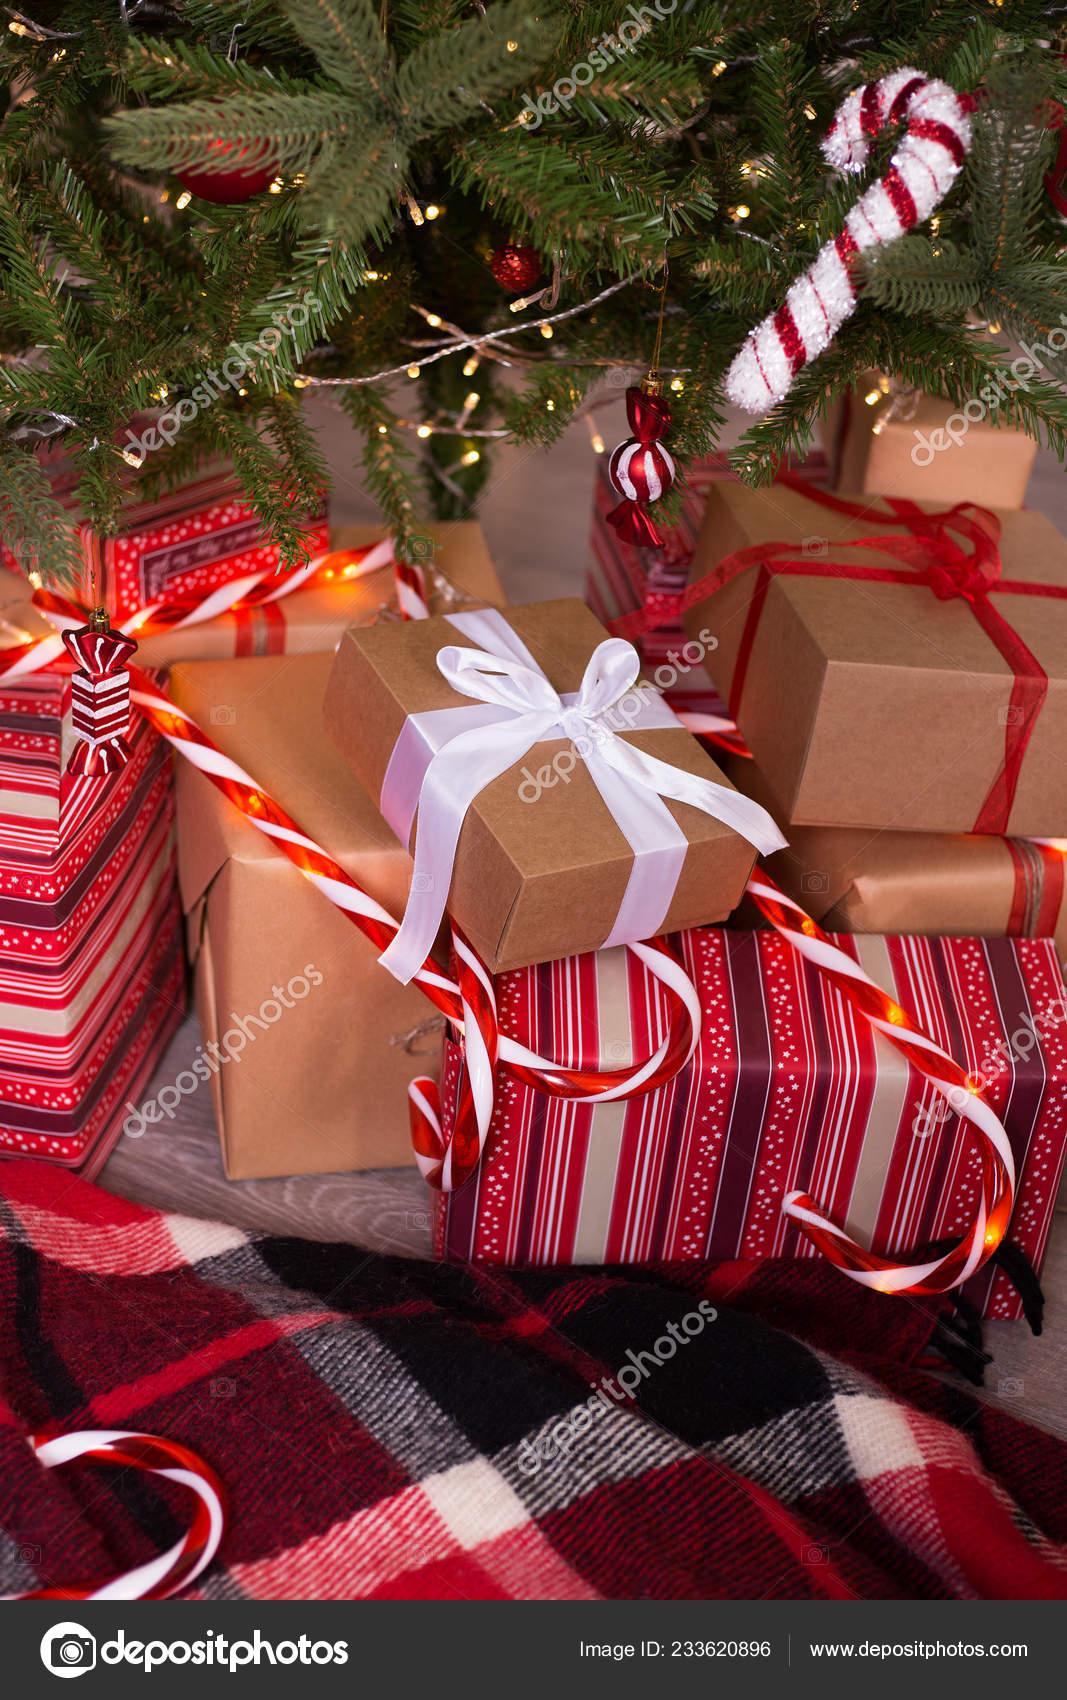 Gifts Christmas Tree Plaid Christmas Tree Gifts Checkered Blanket Stock Photo C Elenaruban Ua Fm 233620896